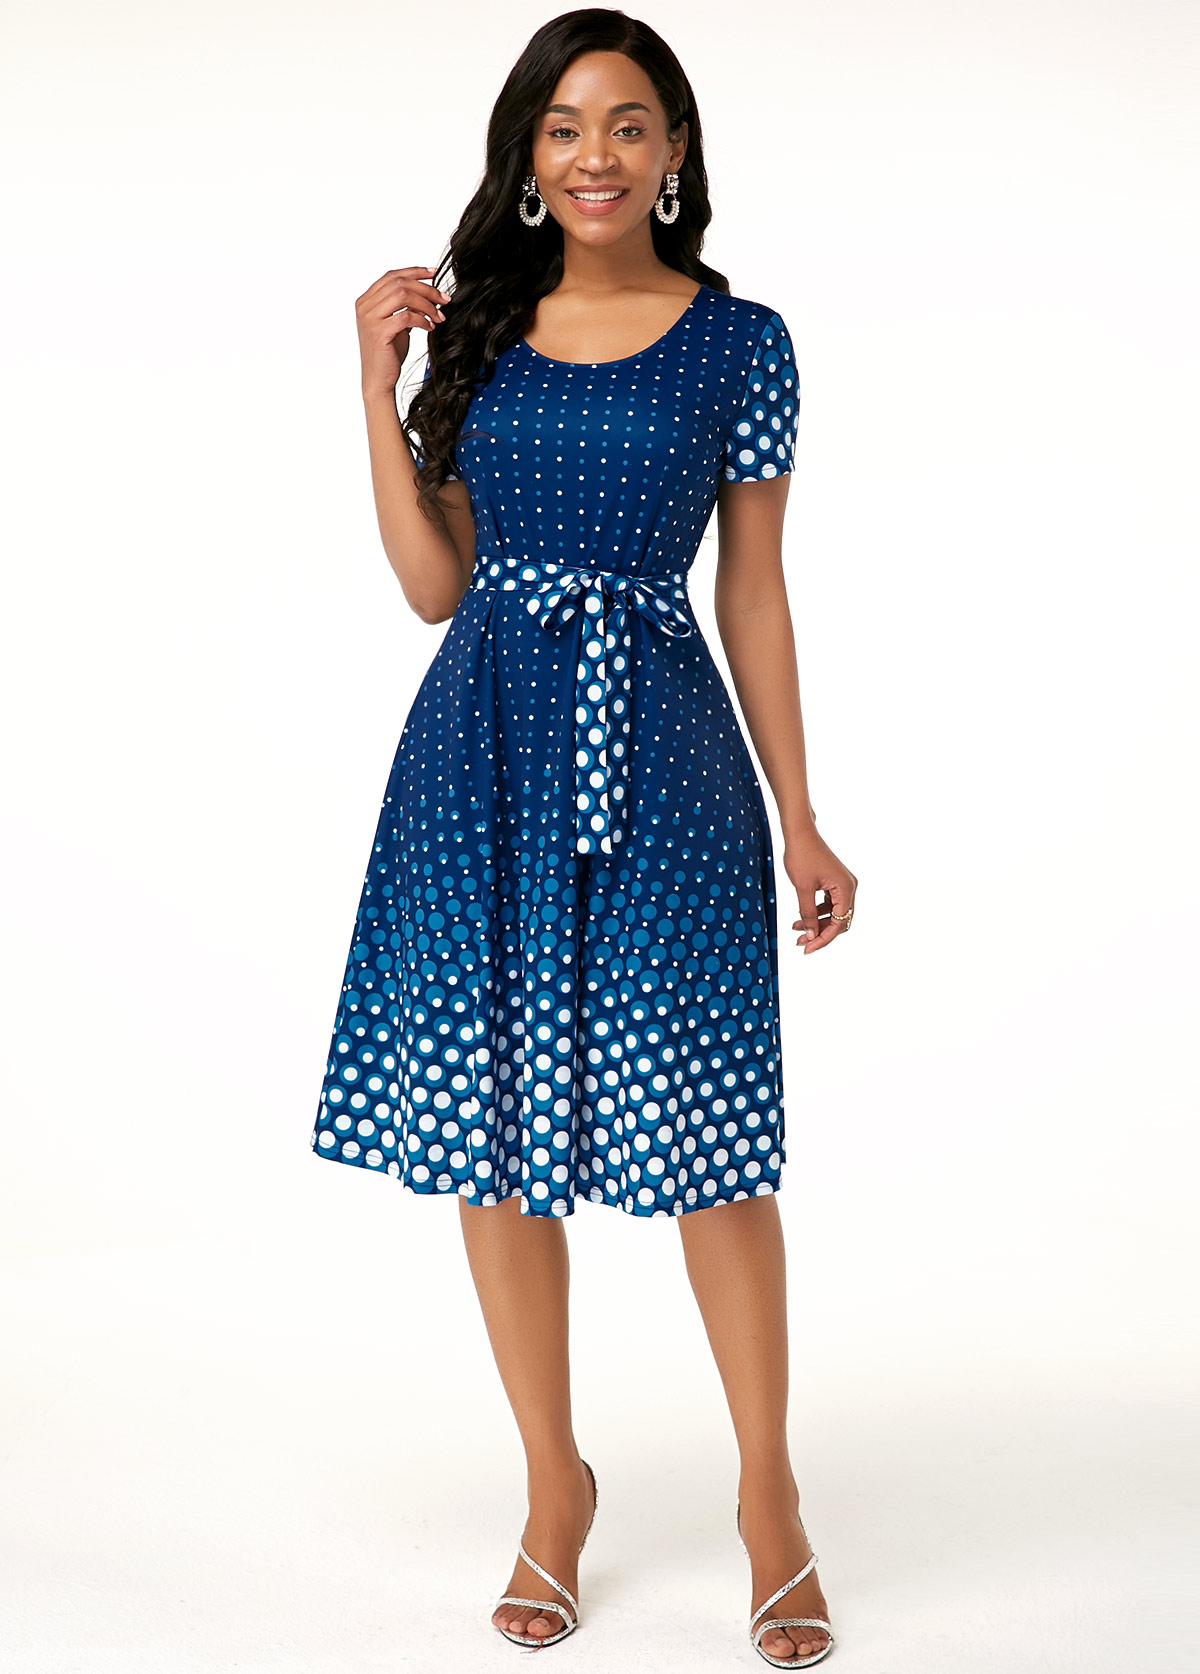 Belted Polka Dot Print Short Sleeve Dress